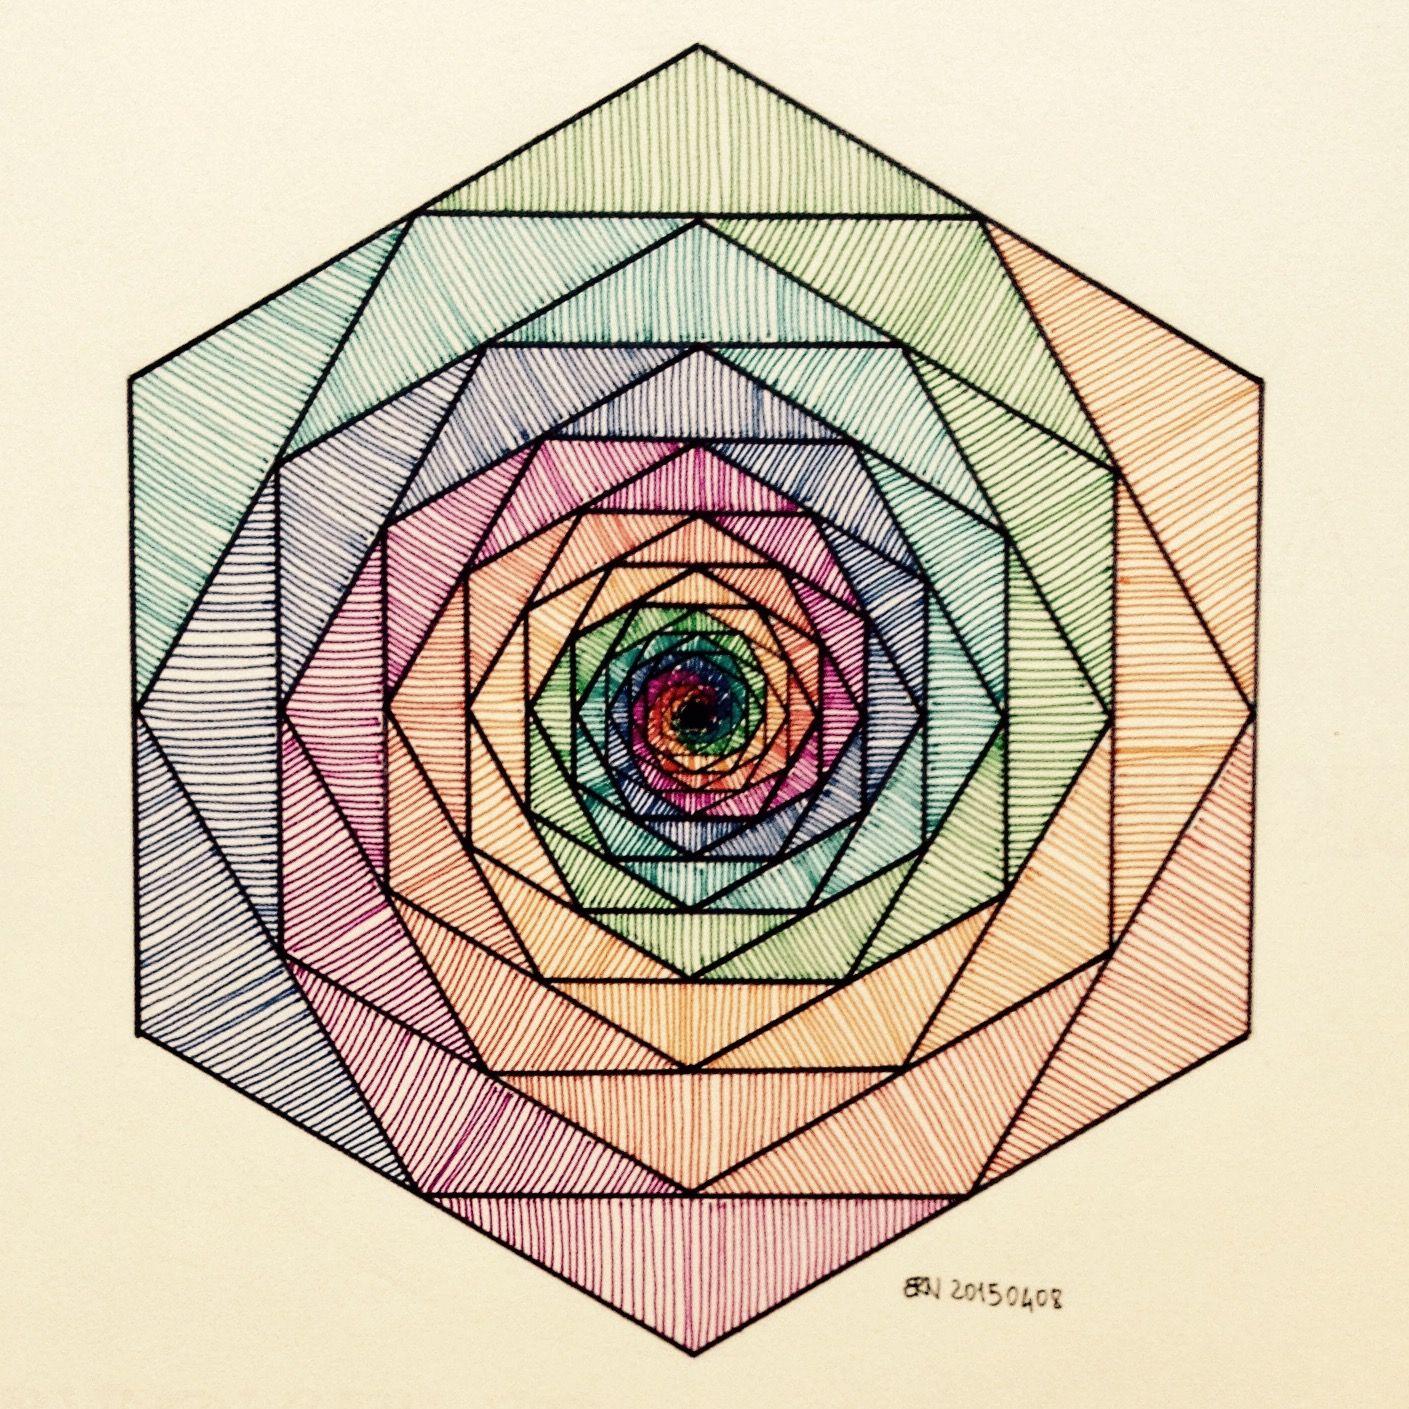 10 geometric art explorations for math learning - HD1409×1409